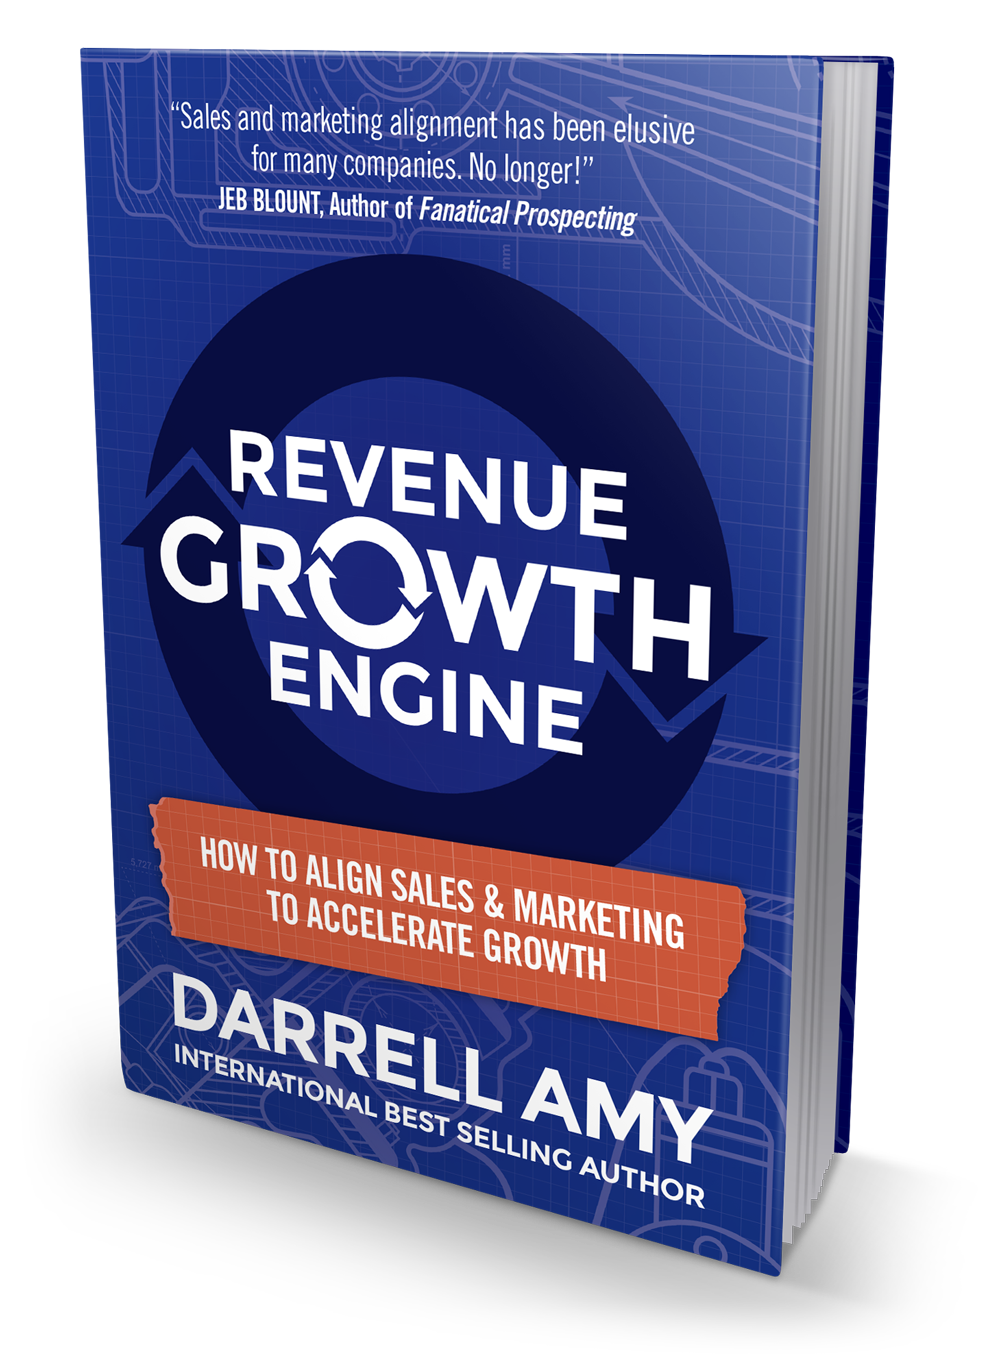 Revenue Growth Engine